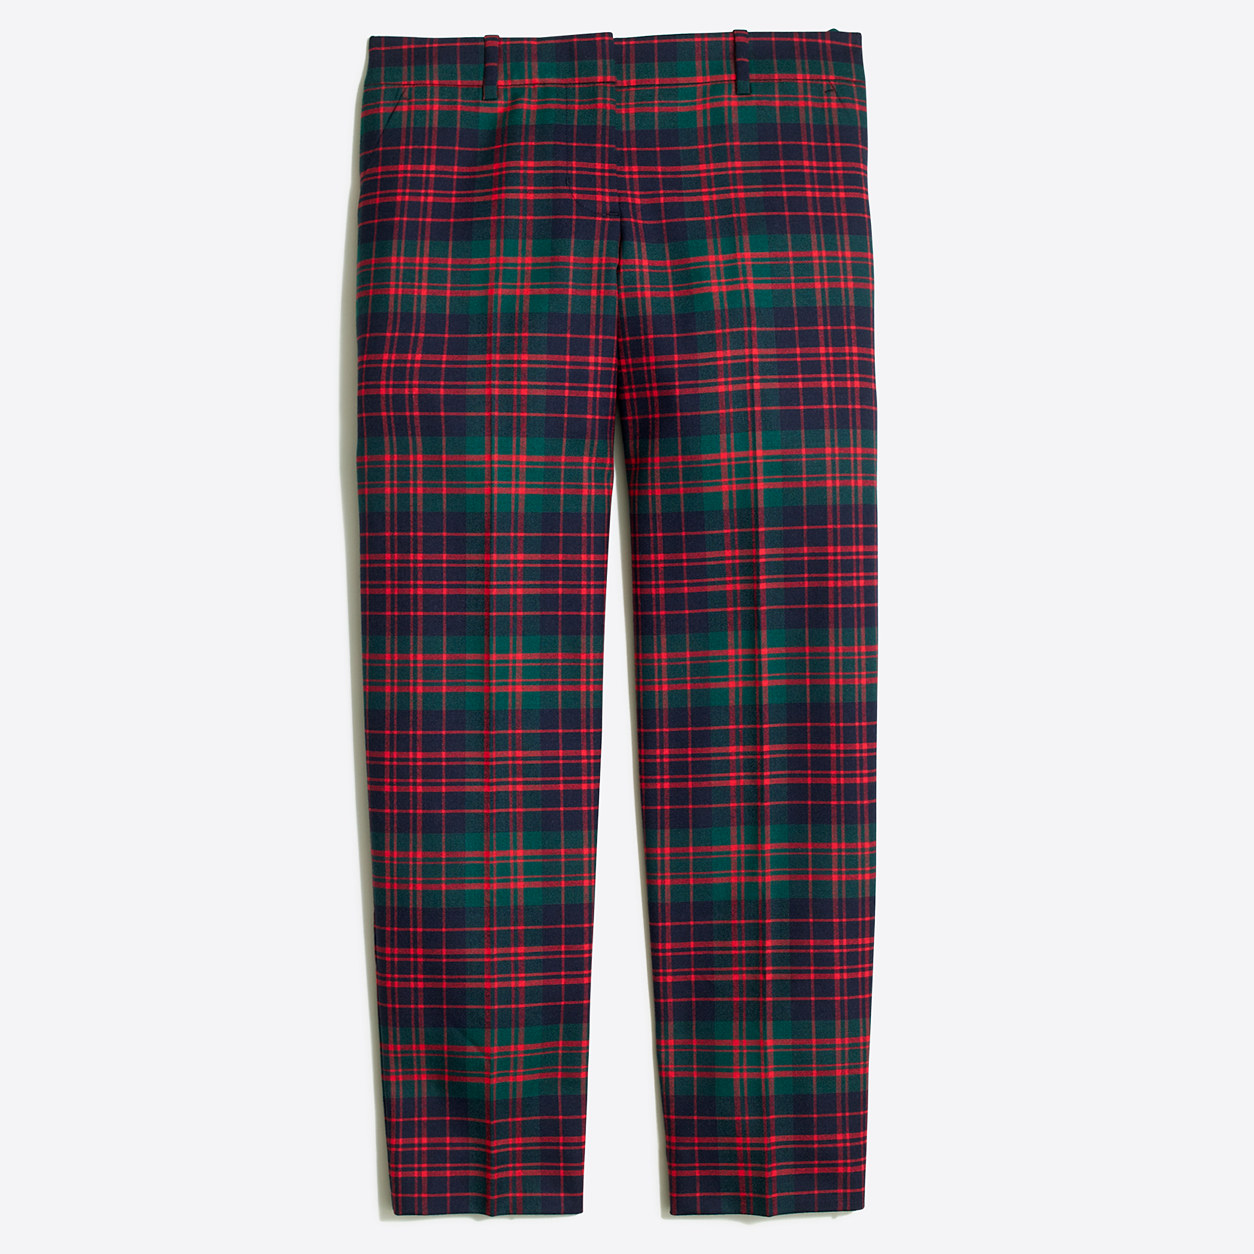 Skimmer Pant In Plaid : Women's Pants | J.Crew